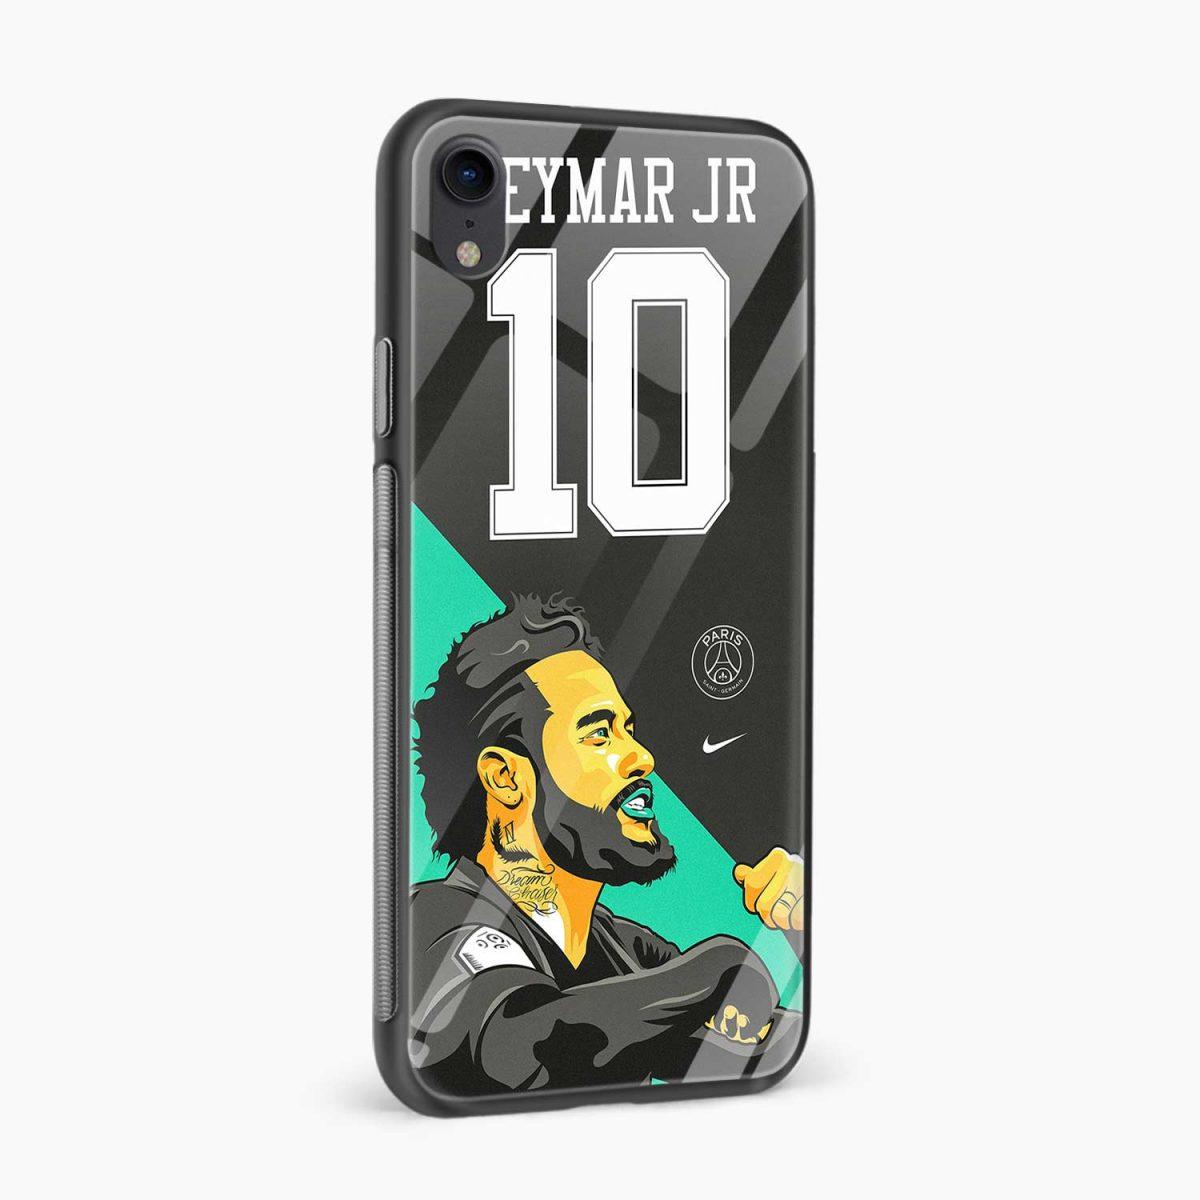 neymar jr 10 apple iphone xr back cover side view